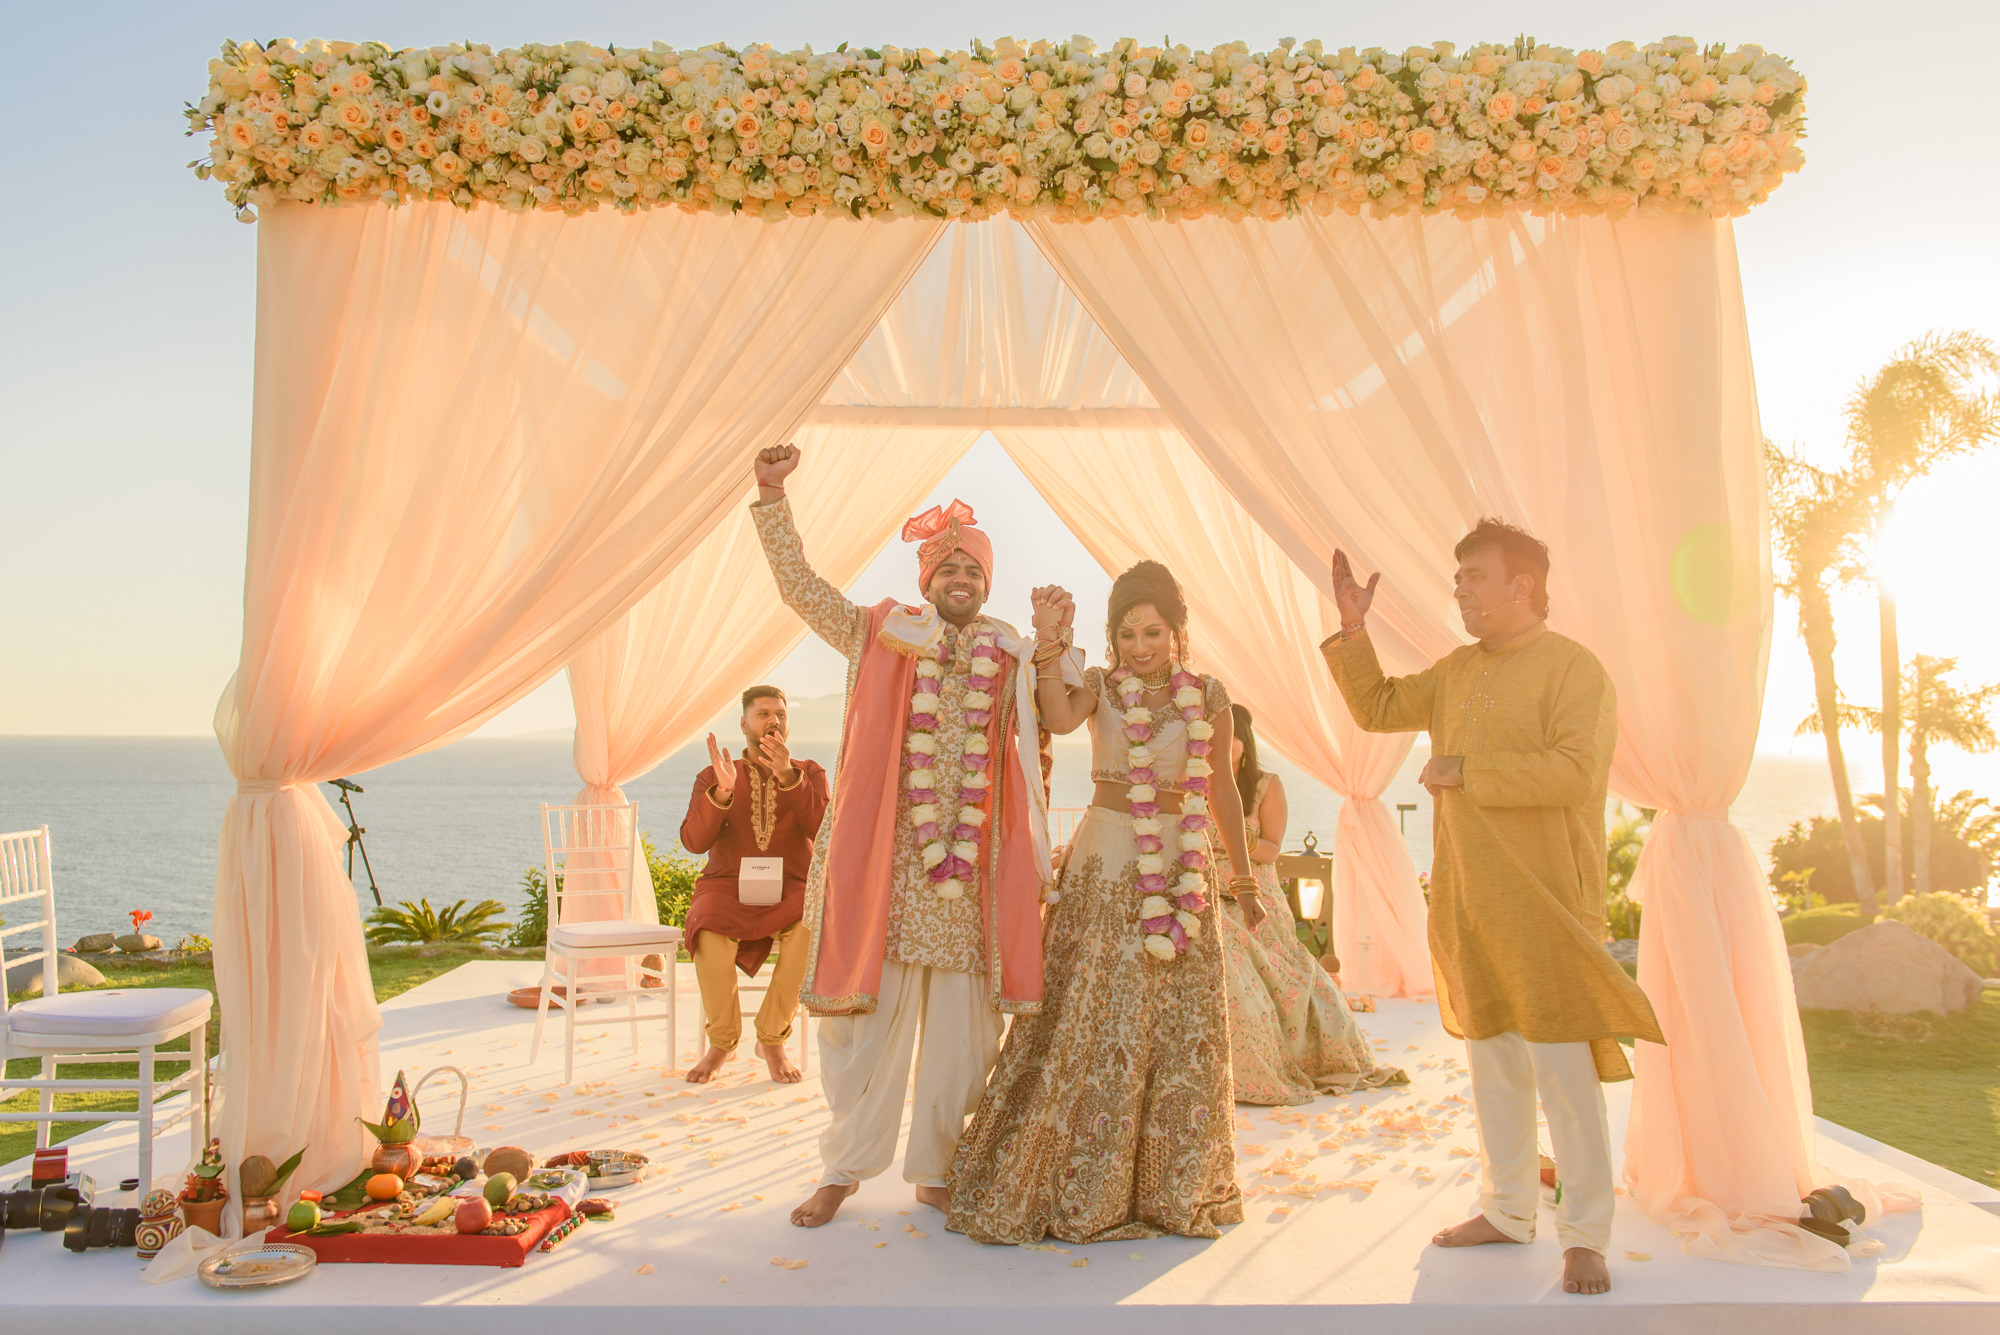 satnam photography wedding indian asian hindu destination wedding photographer tenerife ritz carlton abama-221.jpg